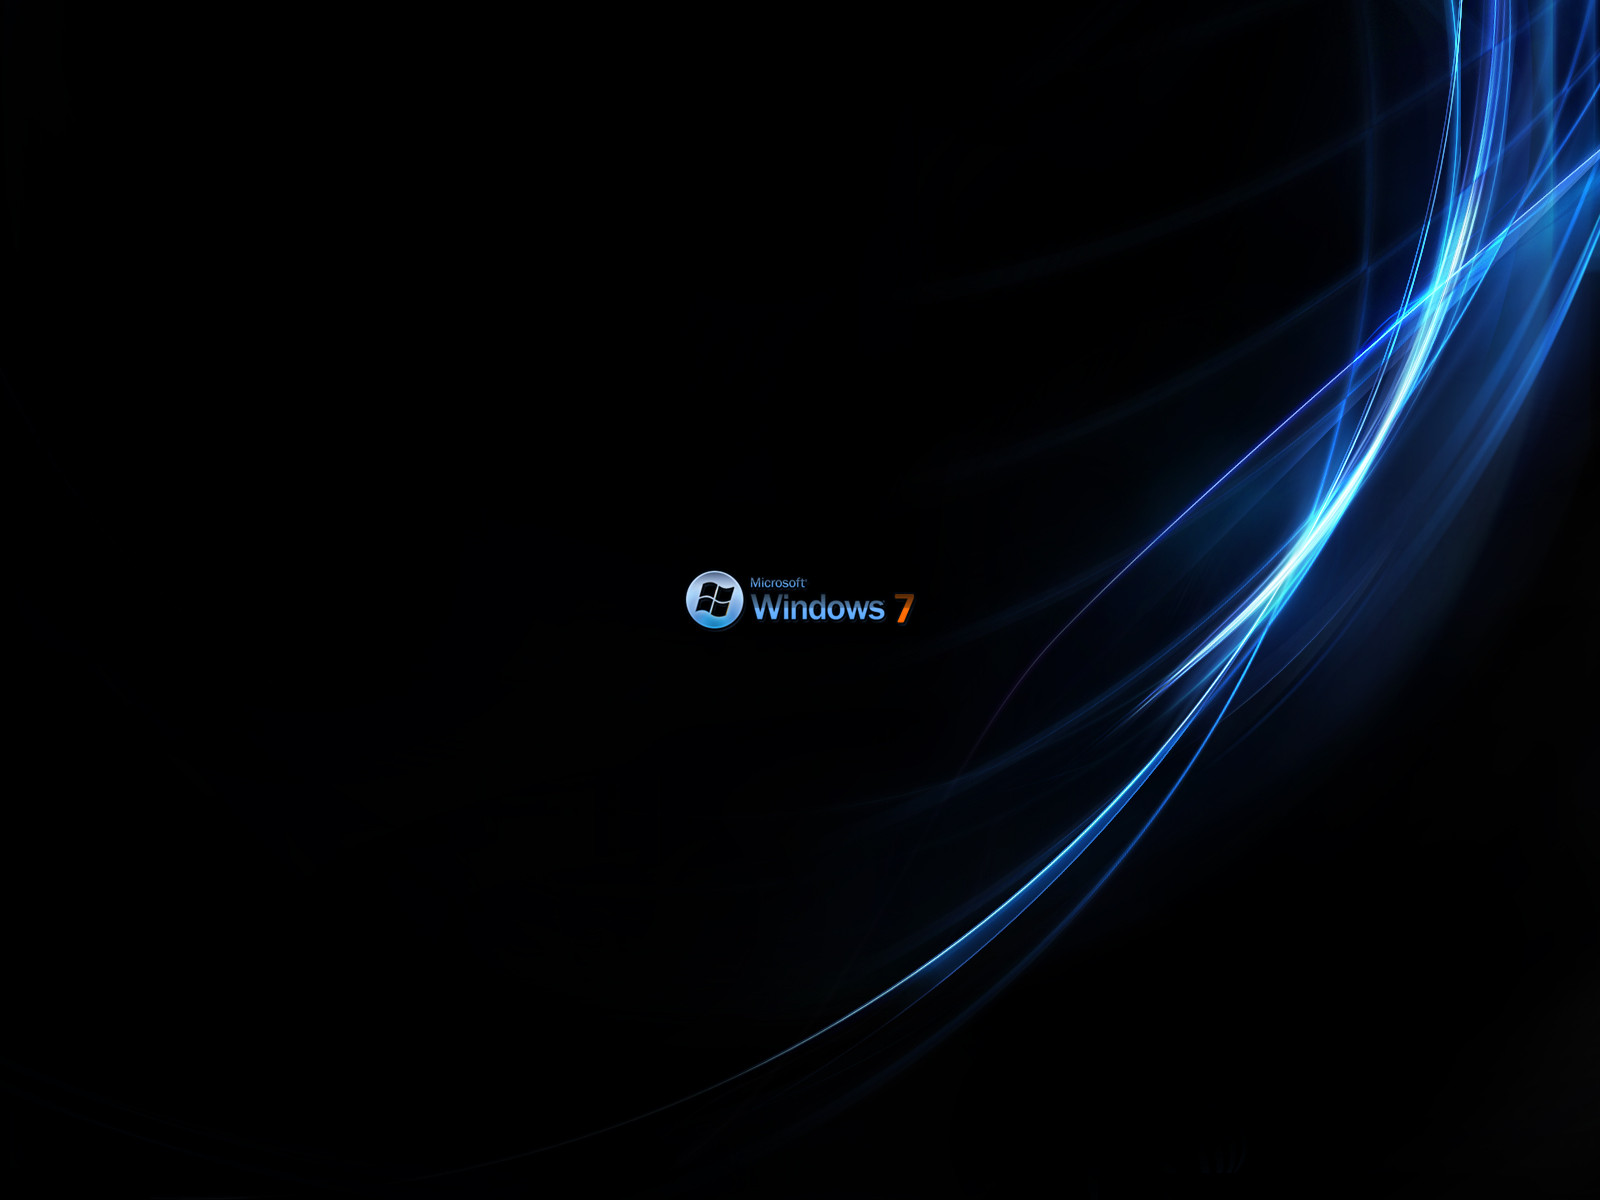 Windows 7 Black Wallpaper Hd  15 Desktop Wallpaper